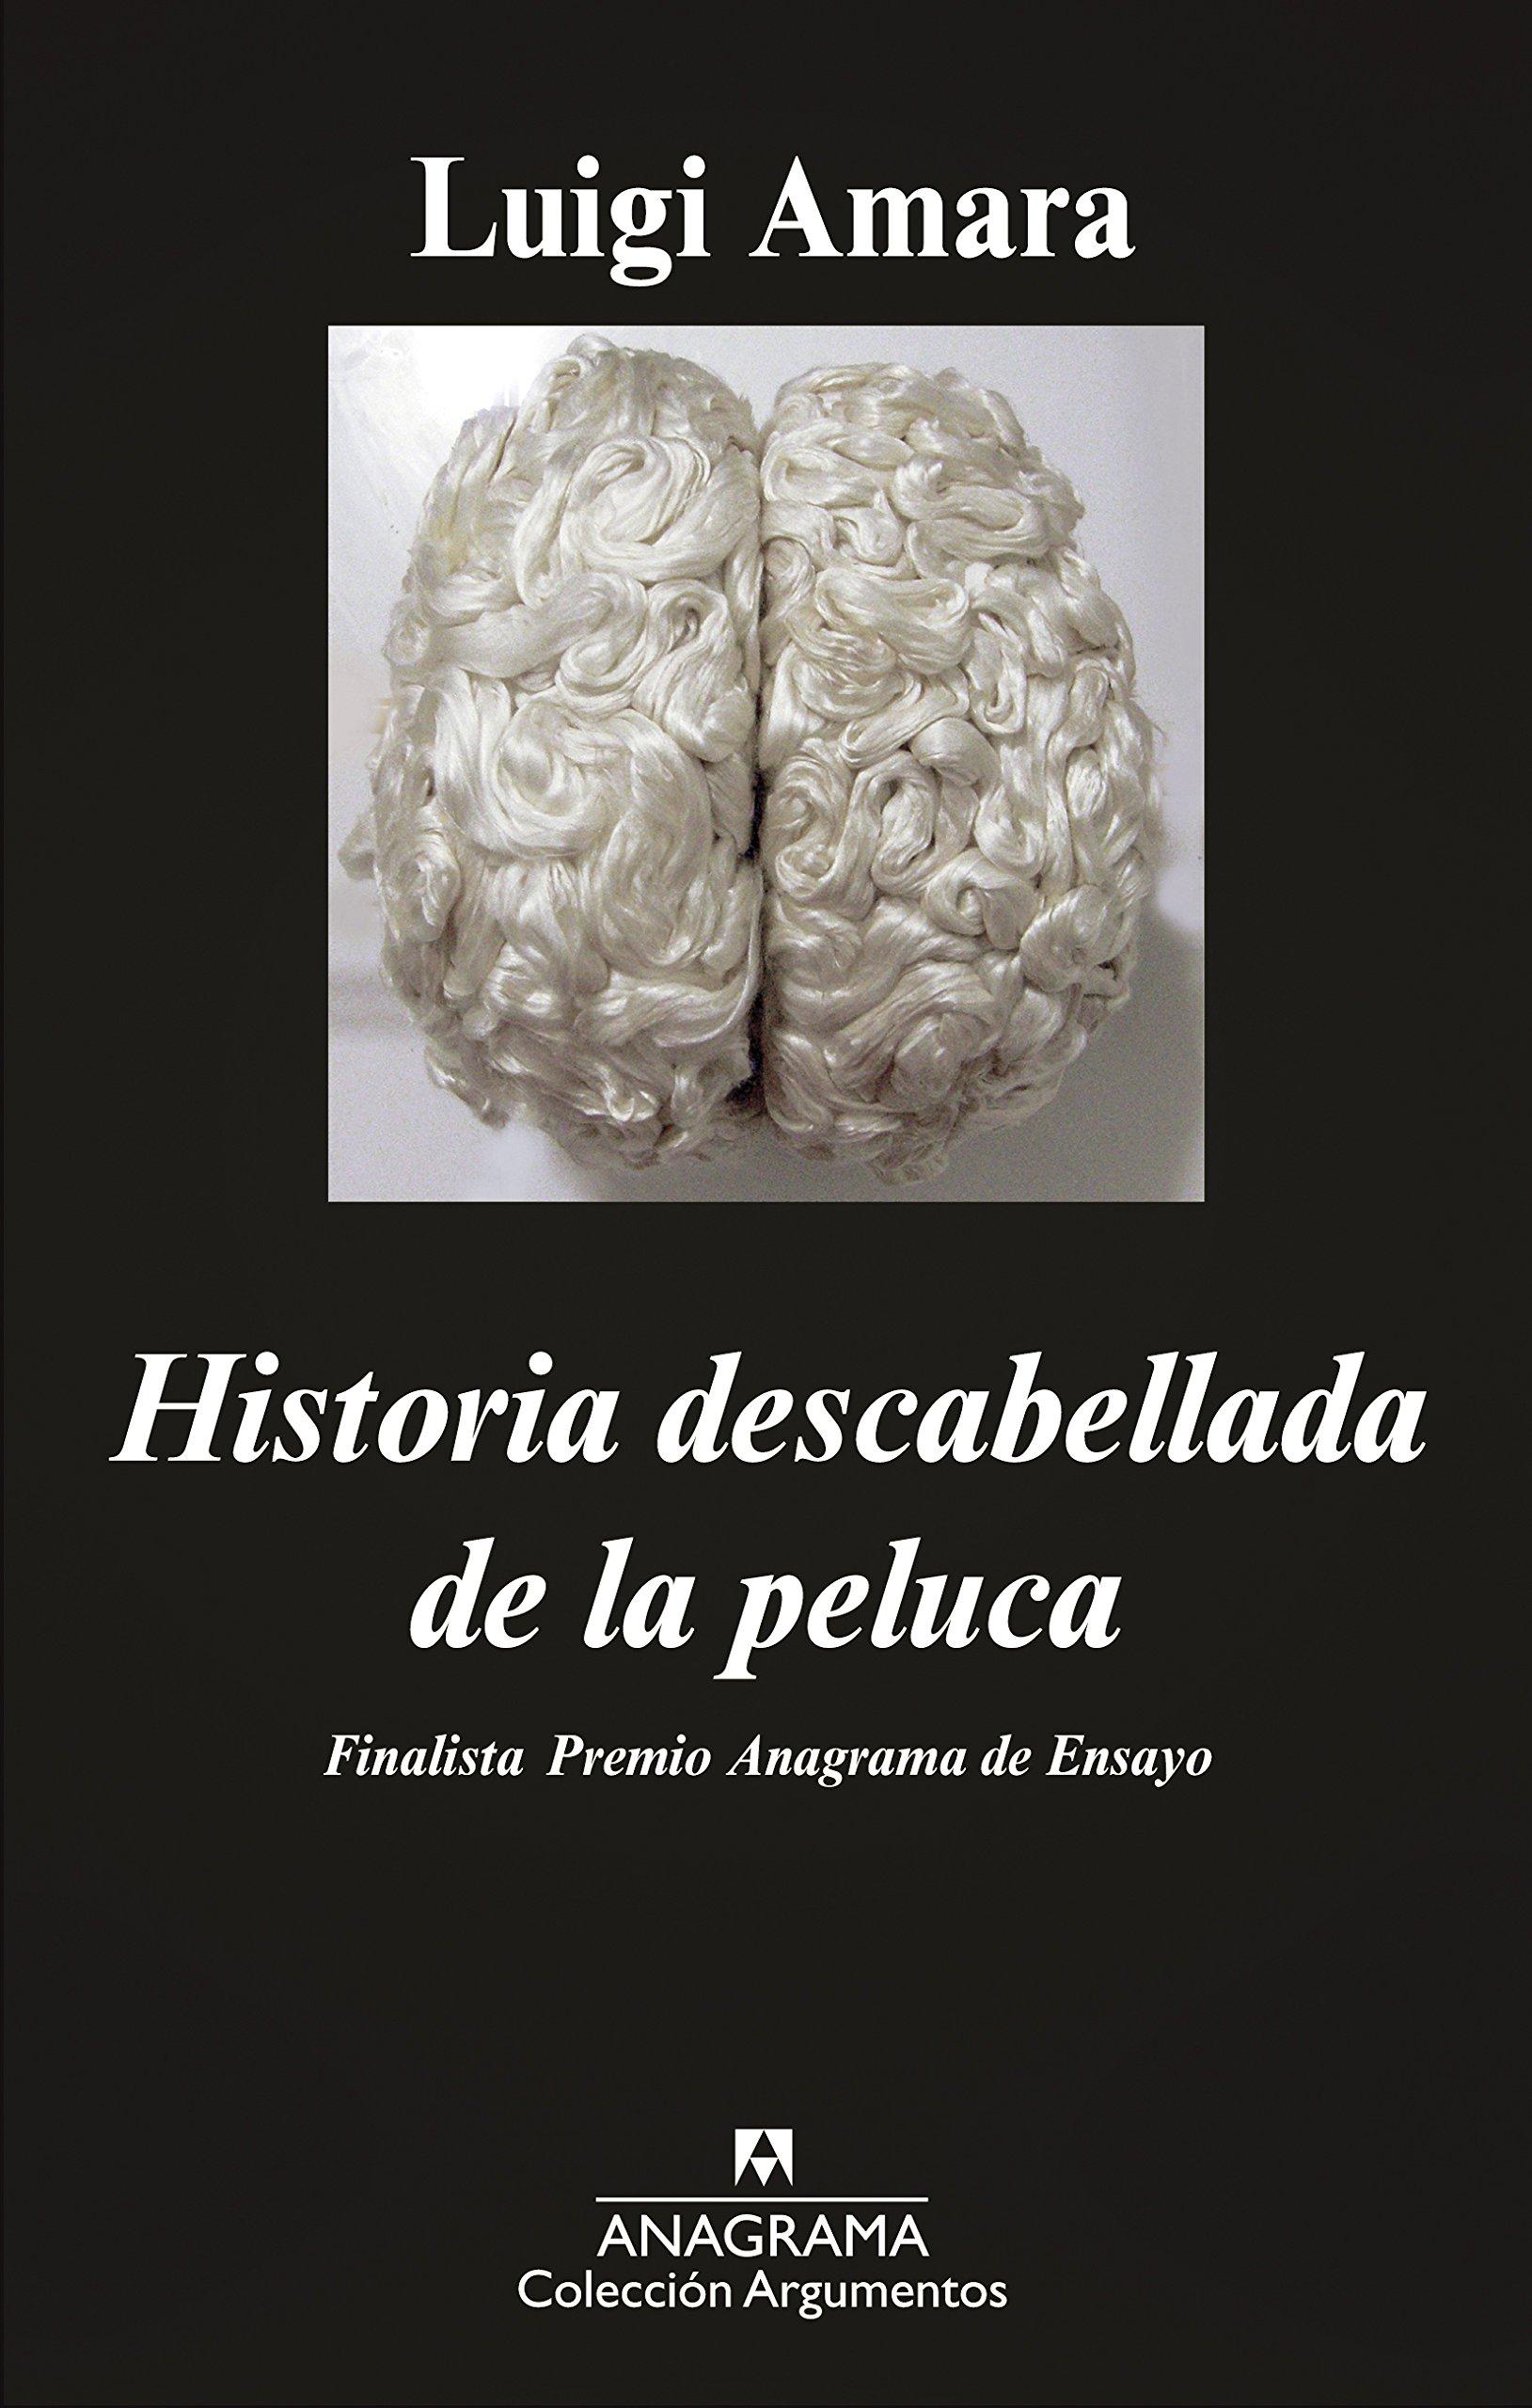 Historia descabellada de la peluca: Luigi Amara: 9788433963673: Amazon.com: Books